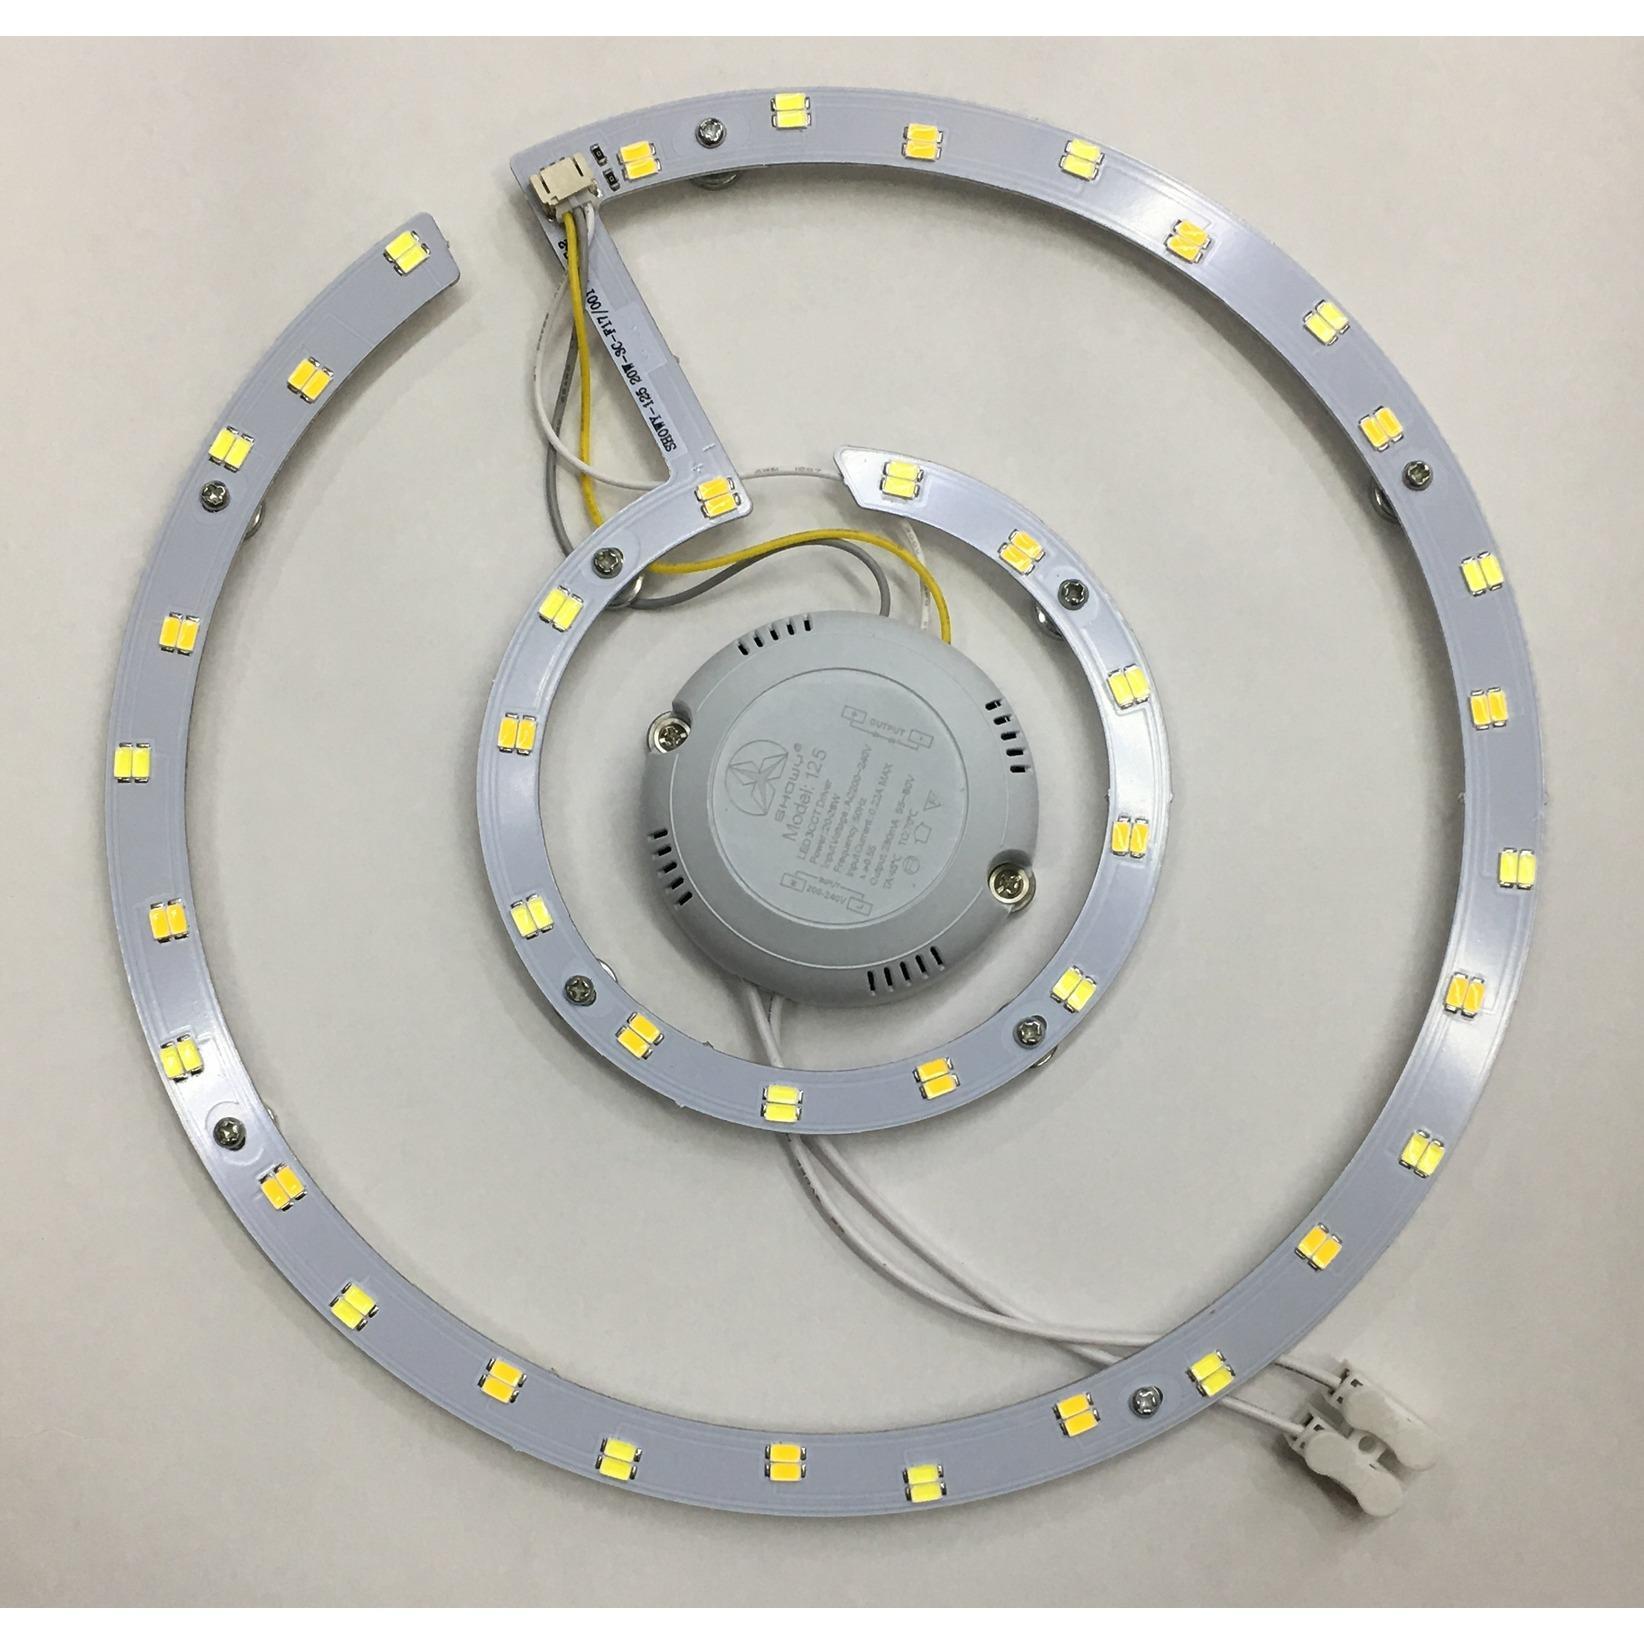 SHOWY 125 20W LED CEILING LAMP BOARD - COOL & WARM